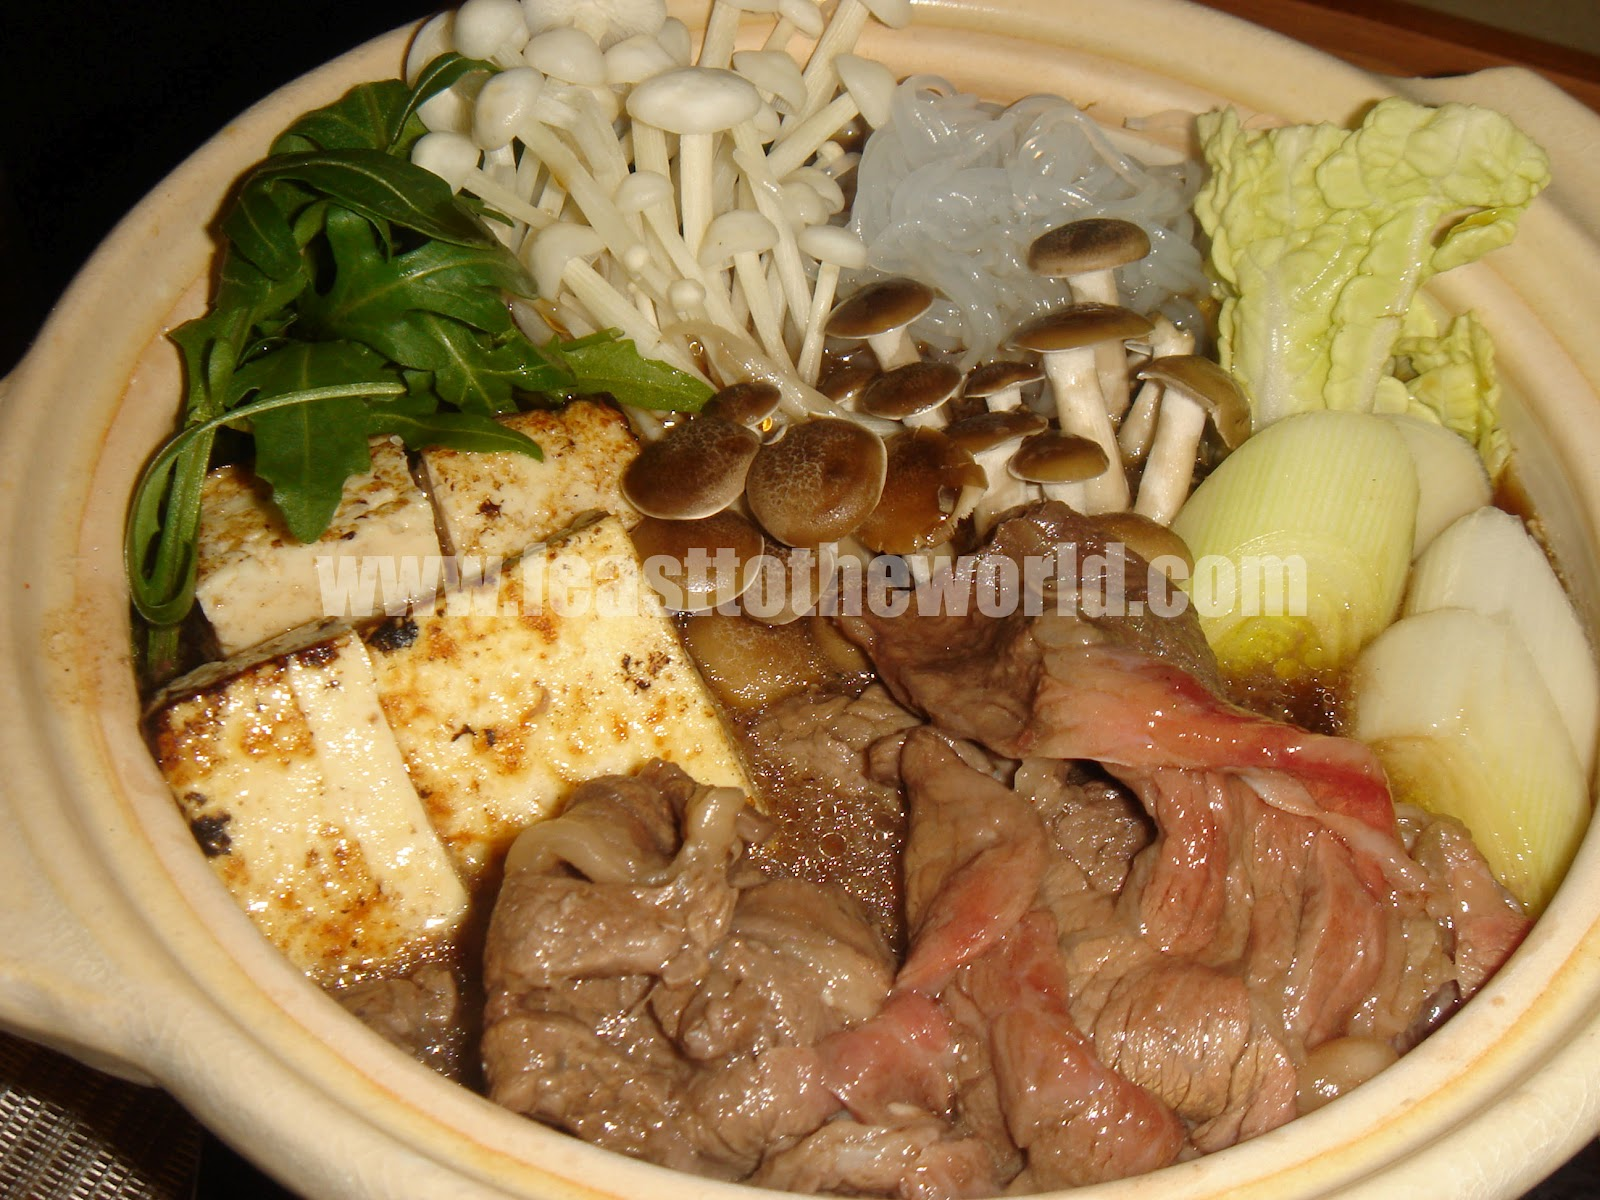 japanese beef hotpot sukiyaki すき焼き dip the cooked beef into